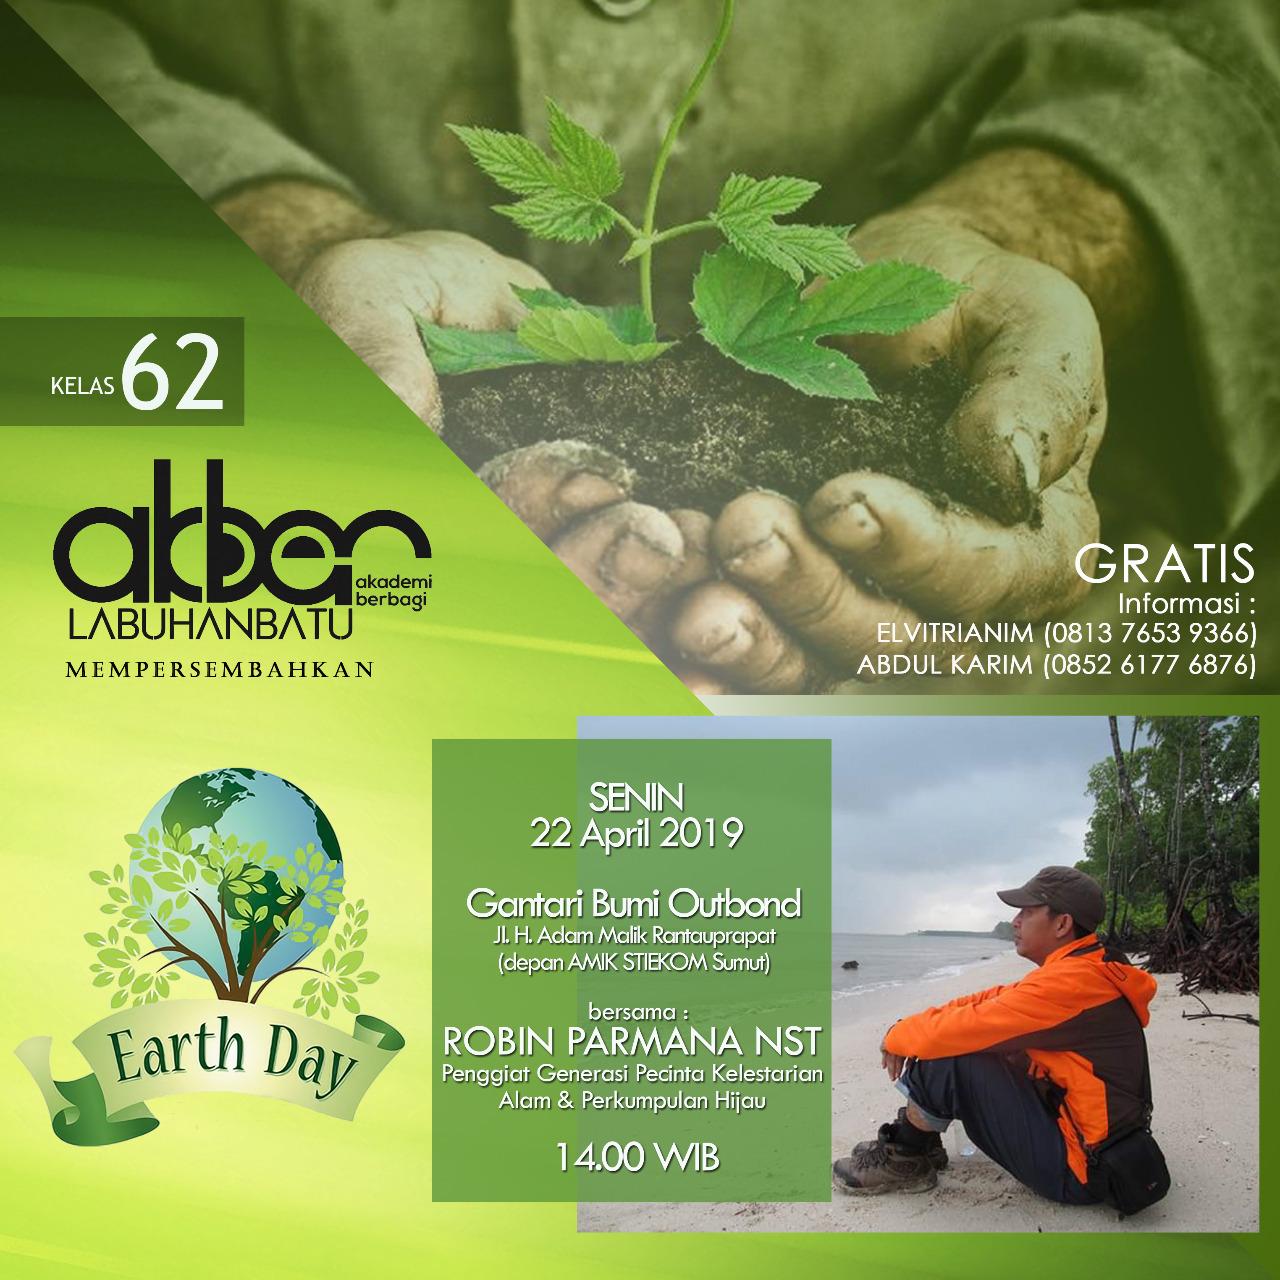 Labuhanbatu: Earth Day